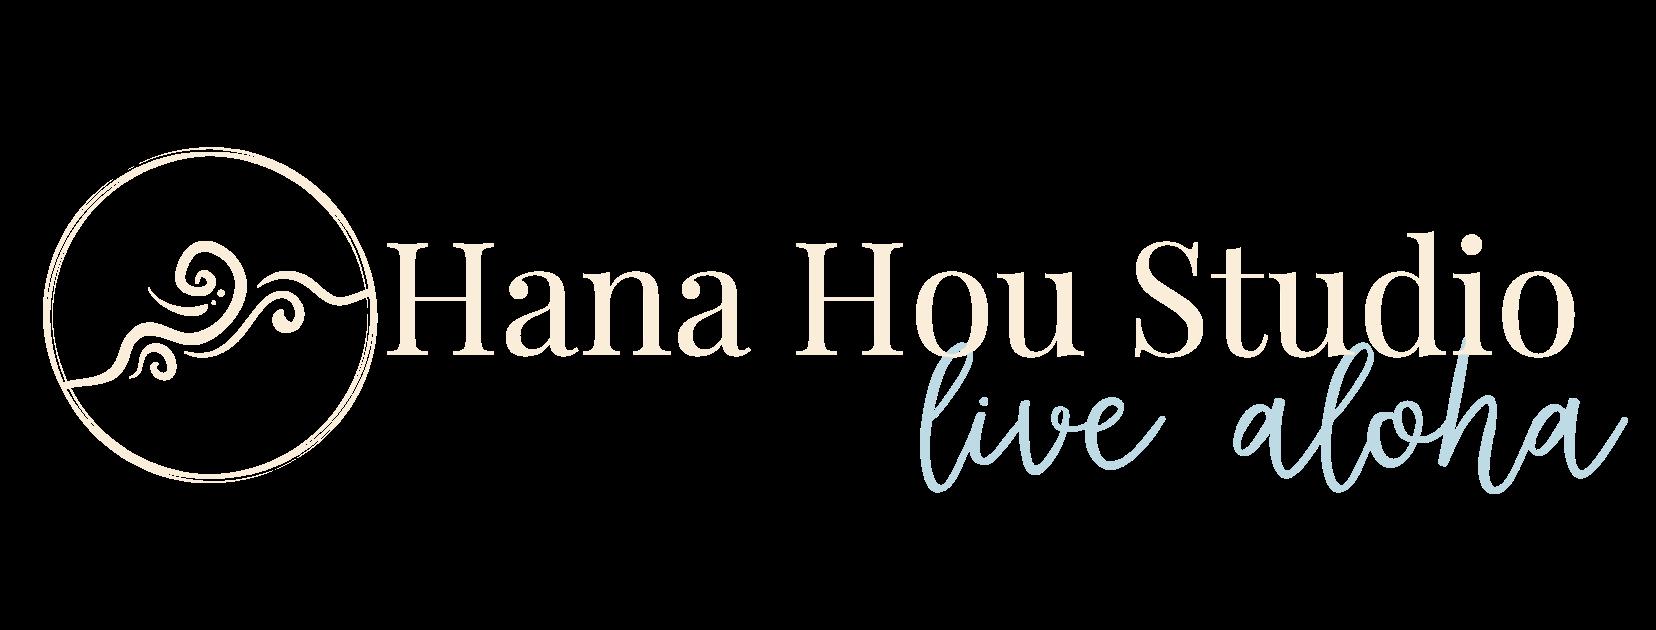 Hana Hou Studio